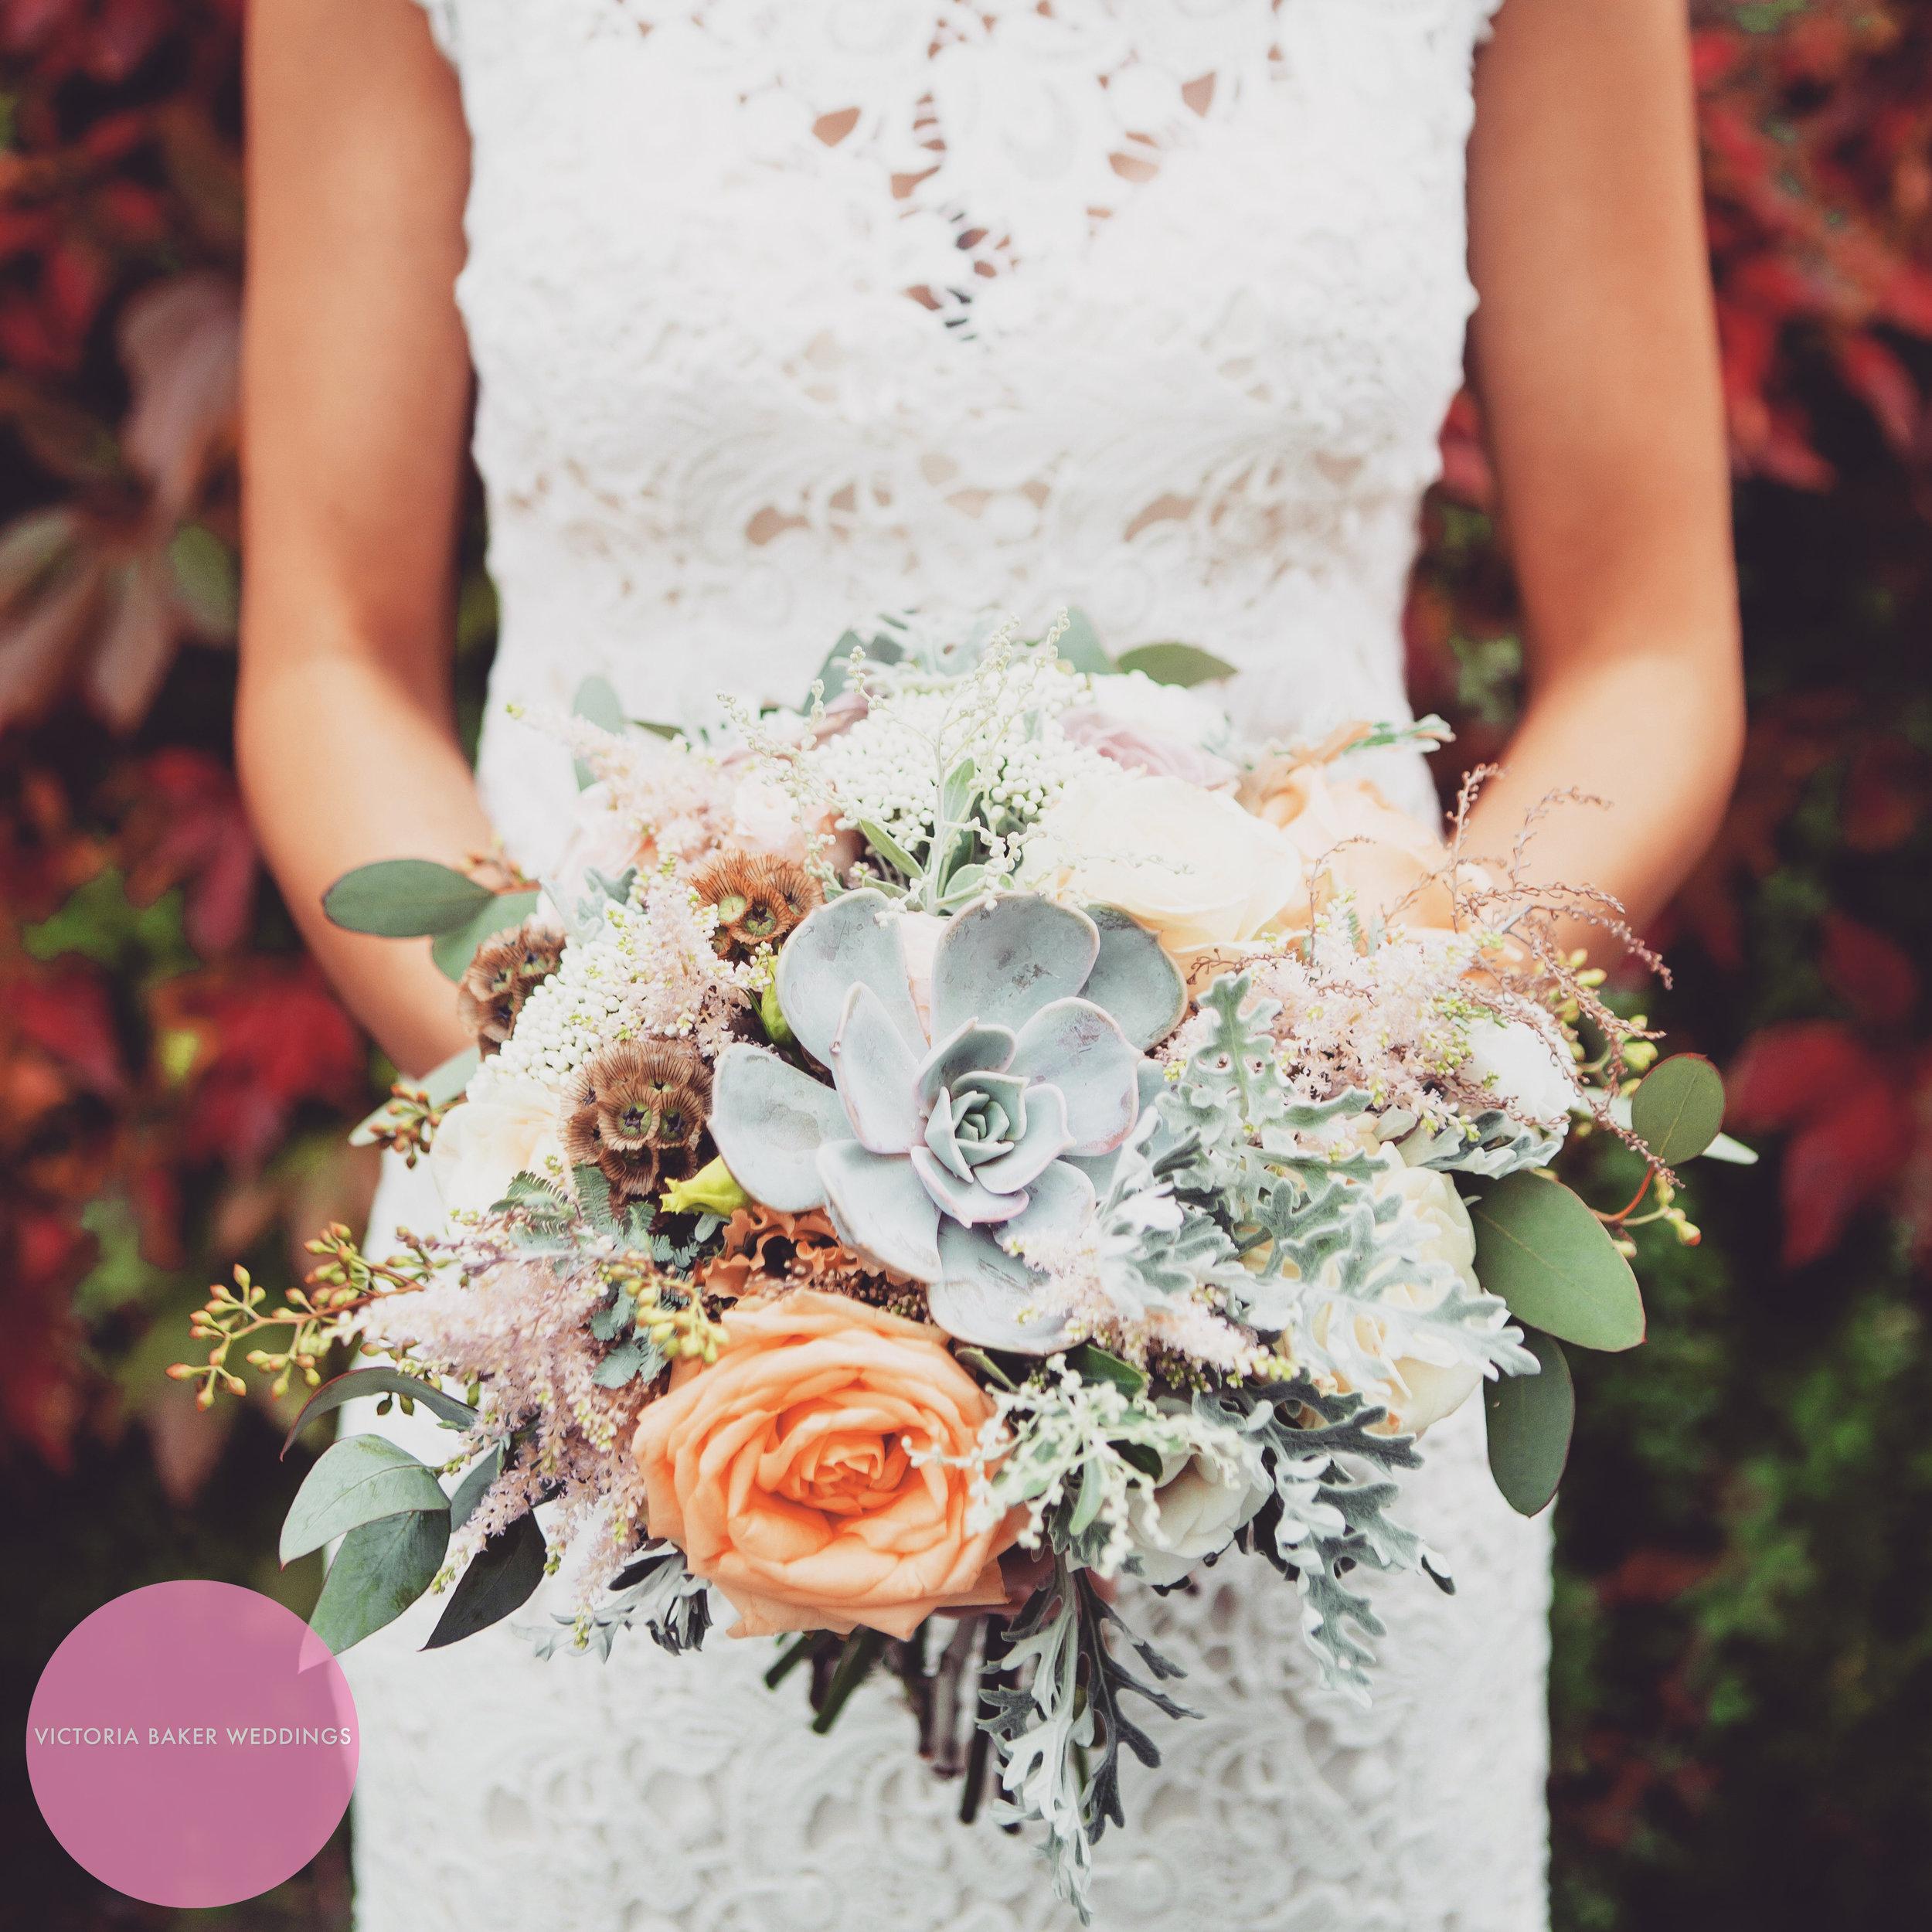 Best Wedding Photographs 2016 - Jenna bridal bouquet